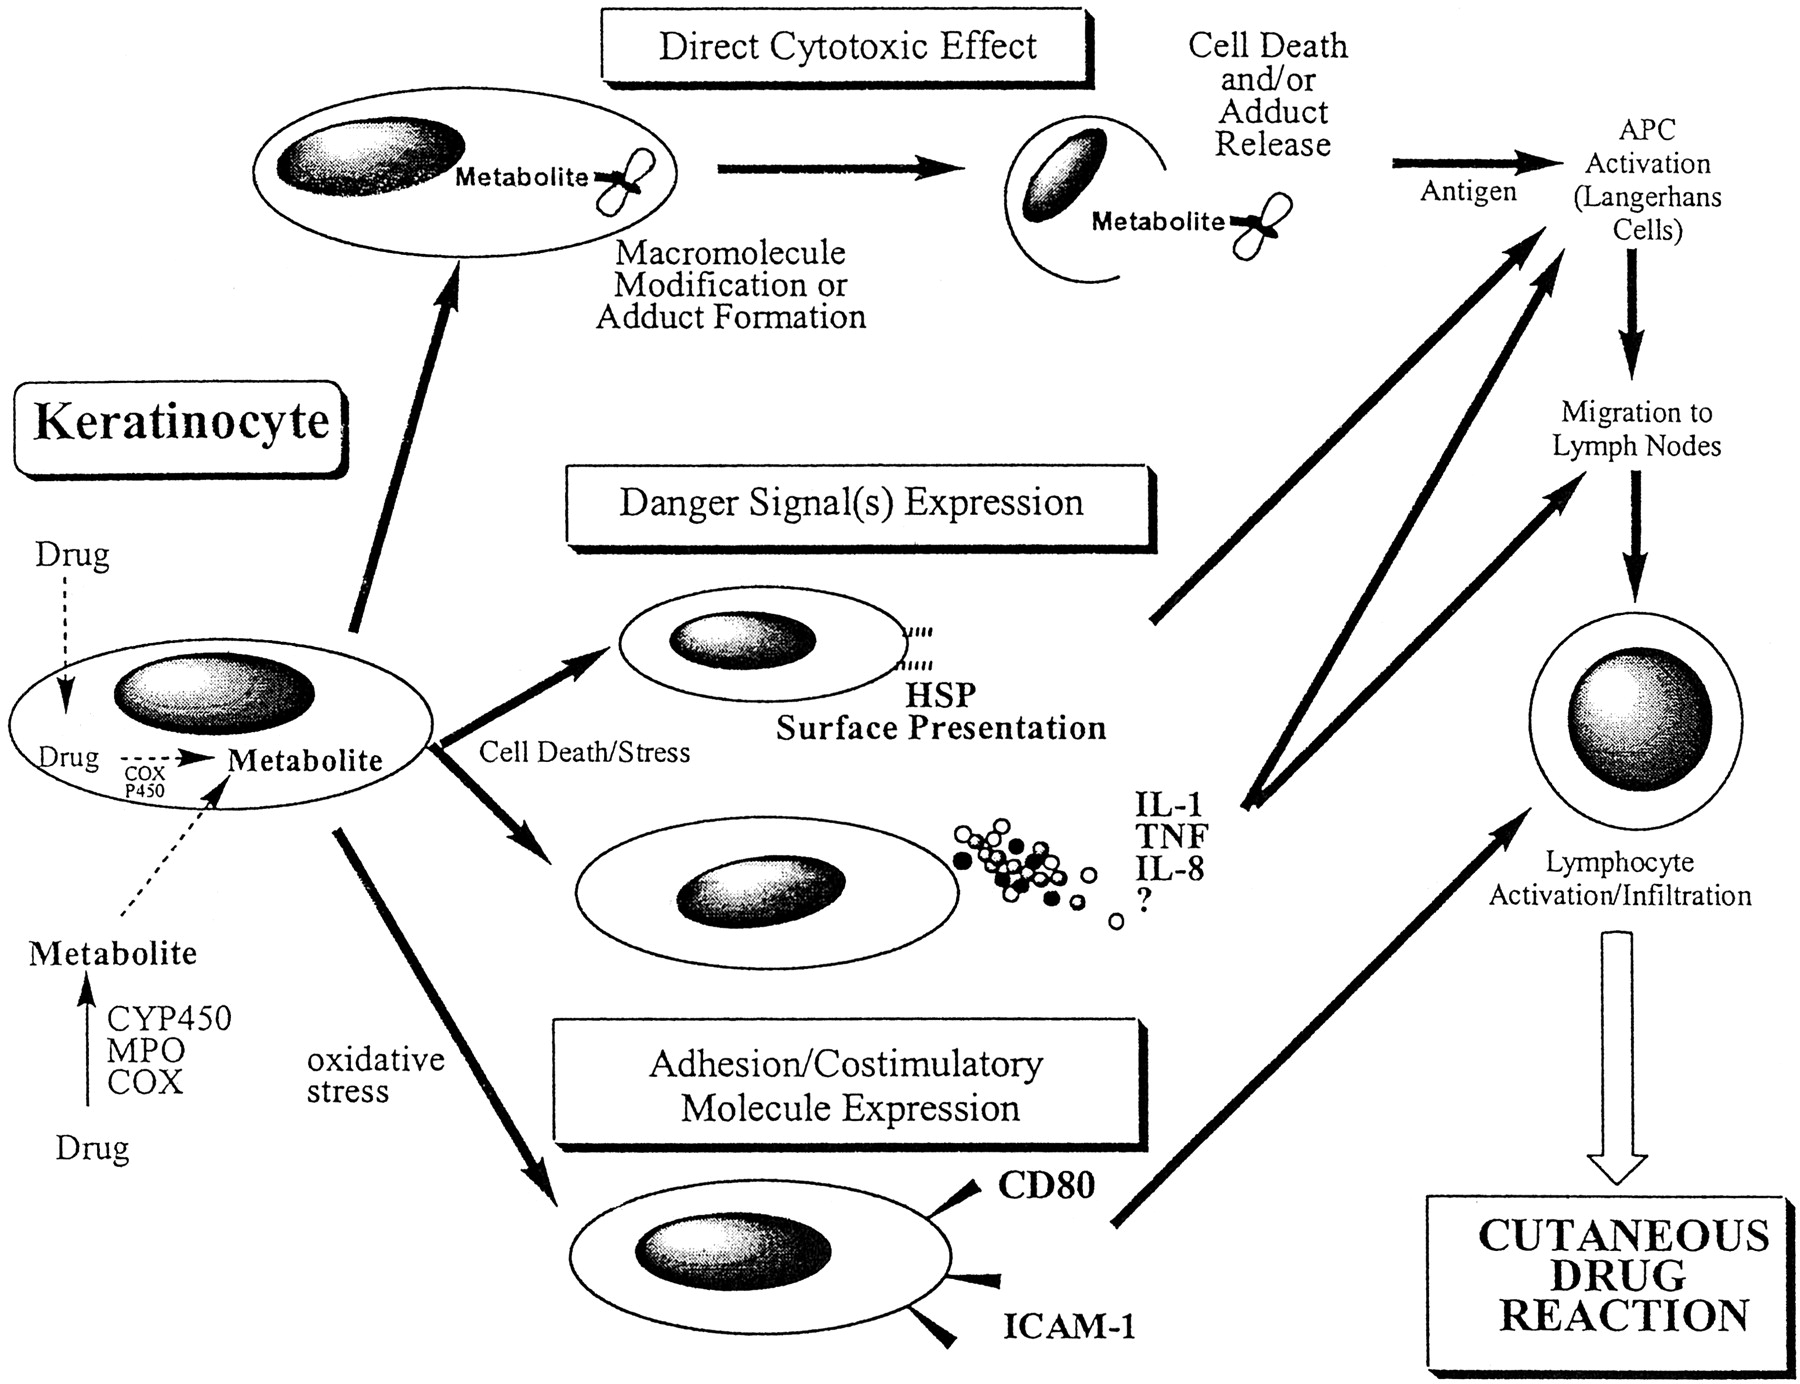 Cutaneous Drug Reactions